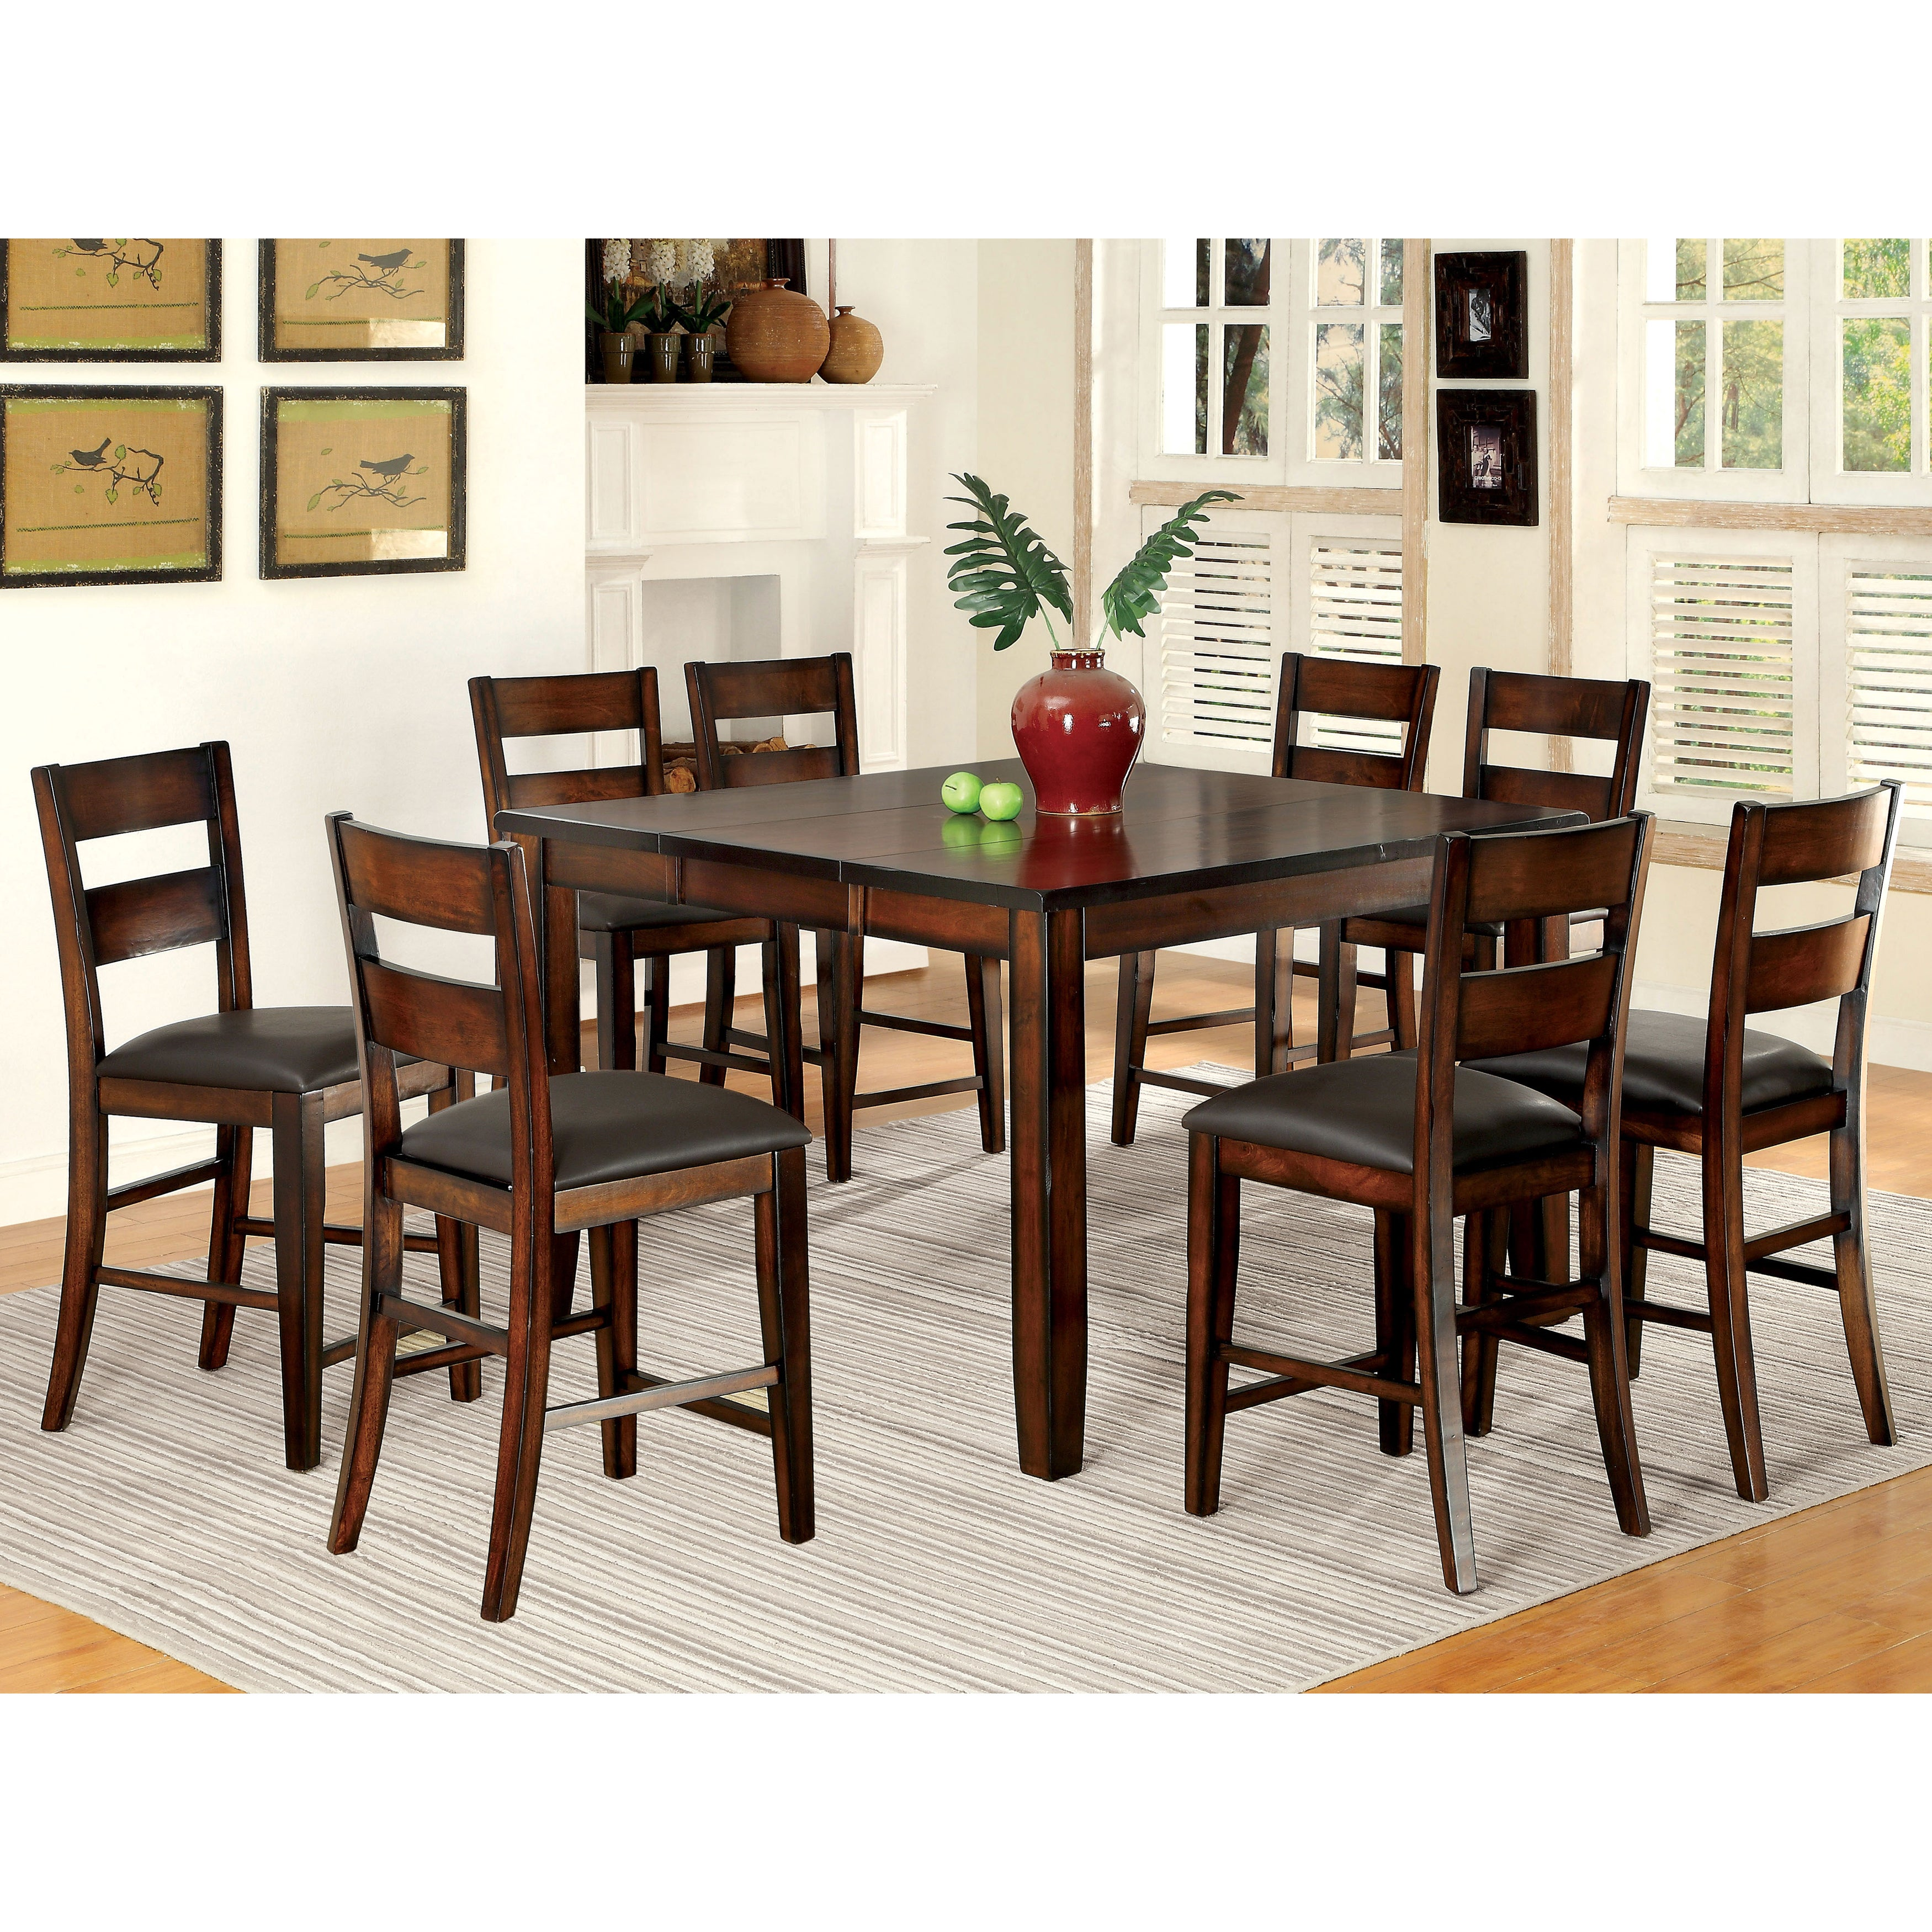 Furniture Of America Paur Modern Cherry 9 Piece Counter Dining Set